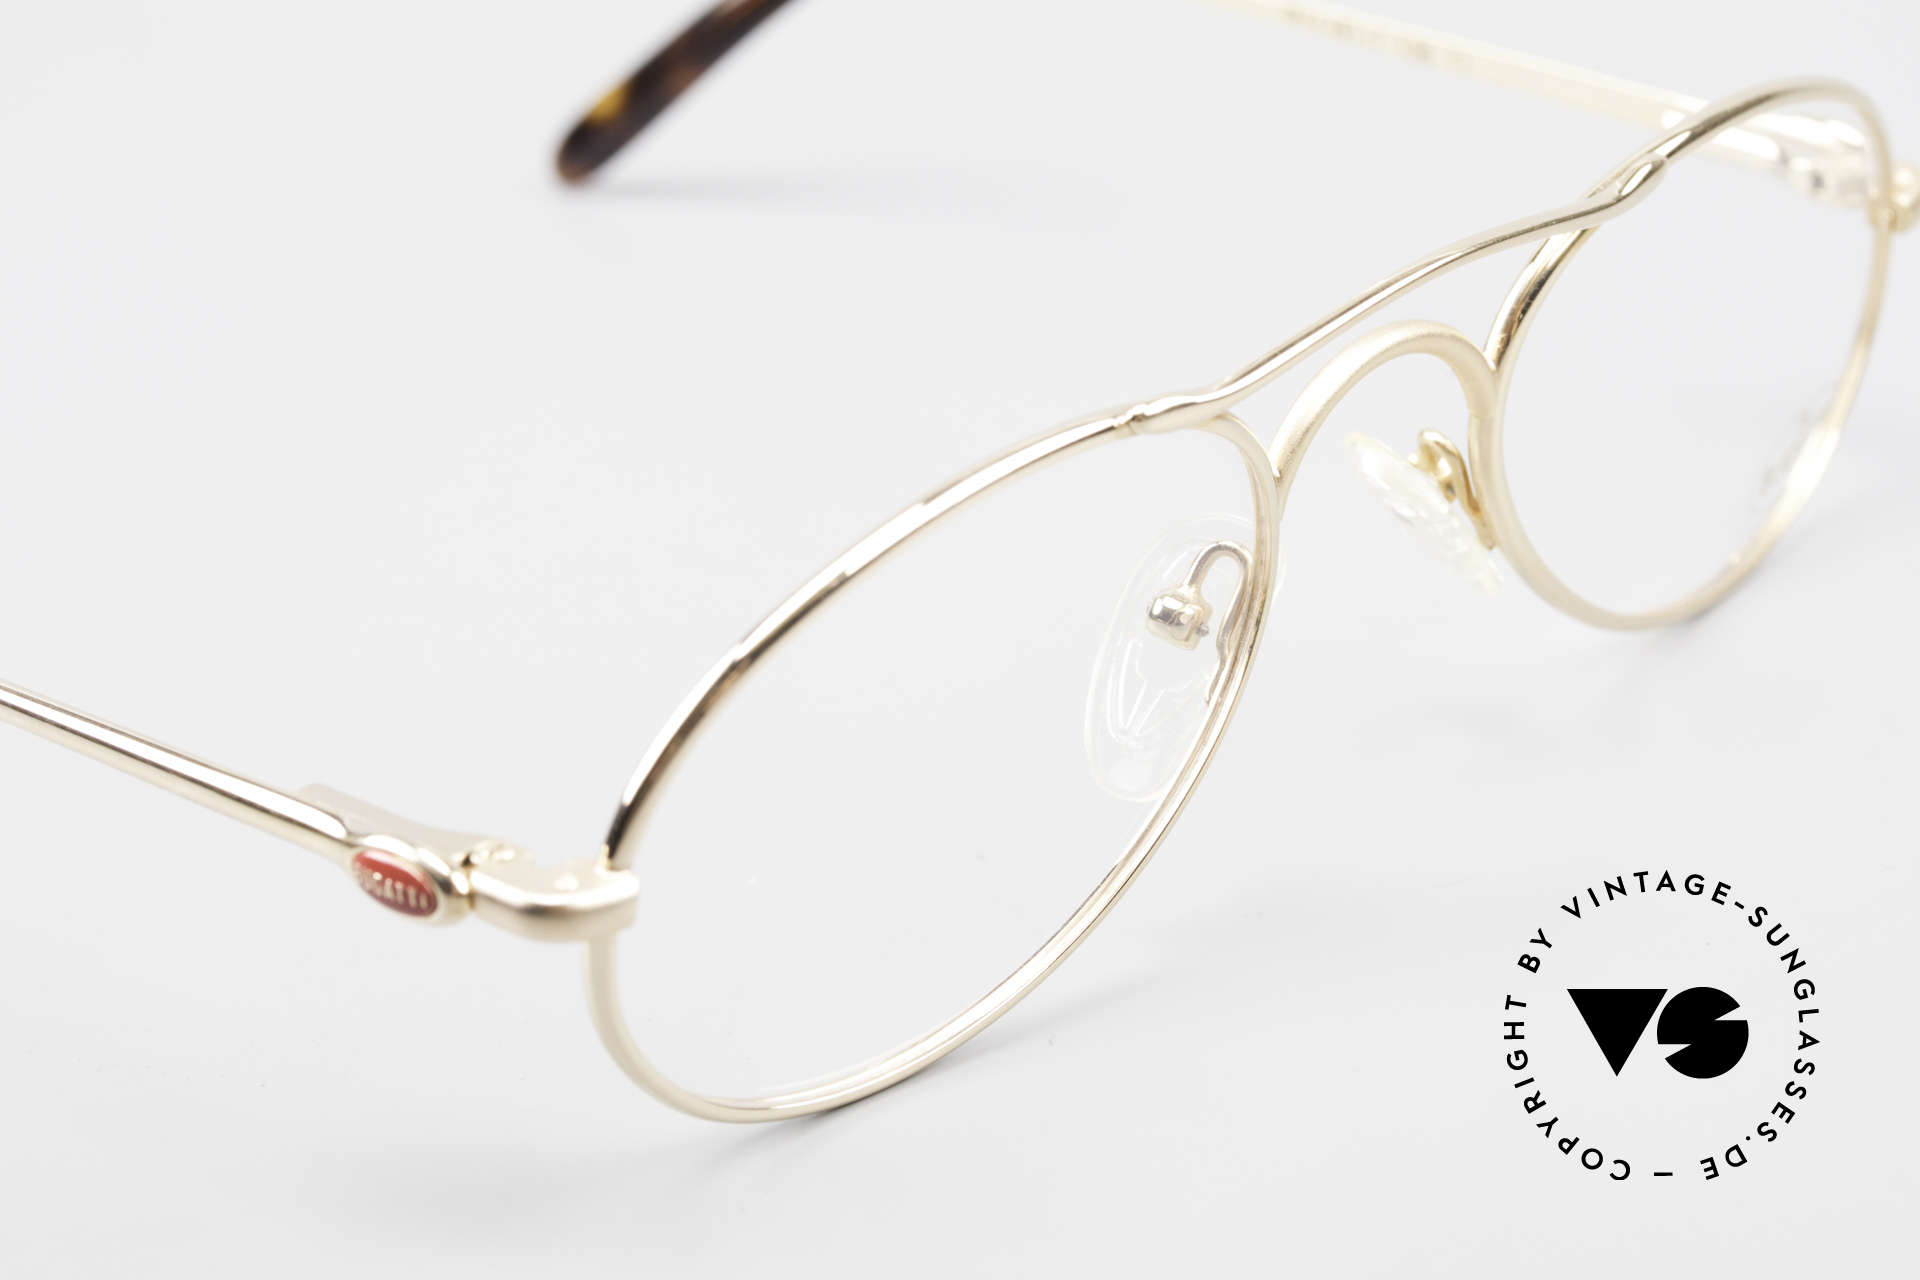 Bugatti 23407 90's Luxury Frame For Men, NO RETRO glasses, but an old 90's original; vertu, Made for Men